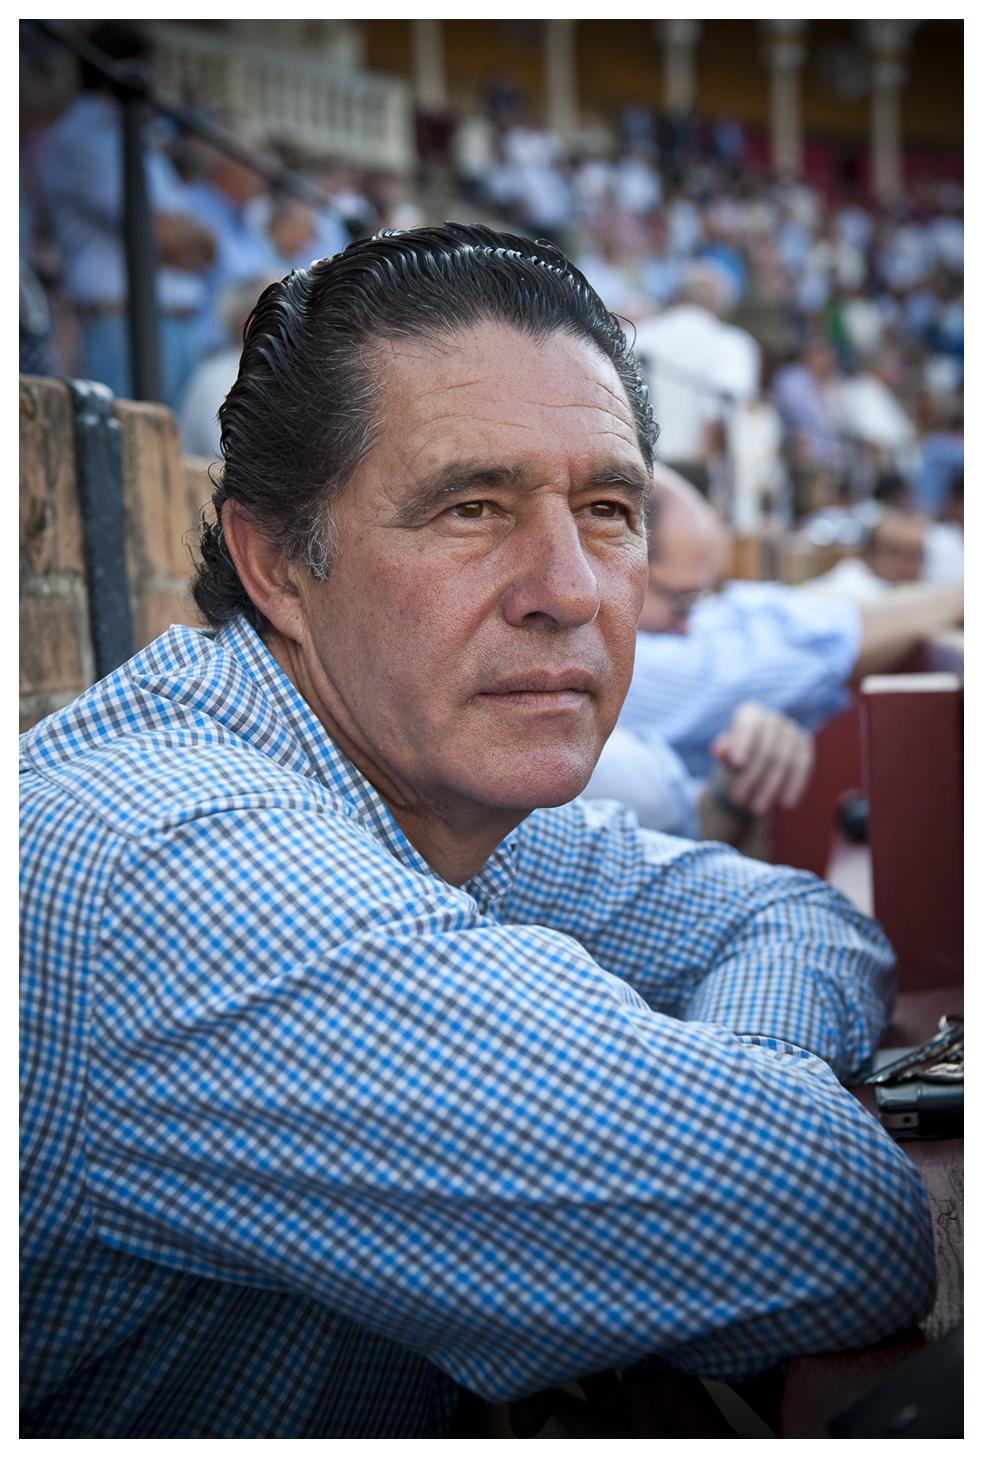 Blog taurino remellao jos antonio campuzano - Jose antonio gavira ...